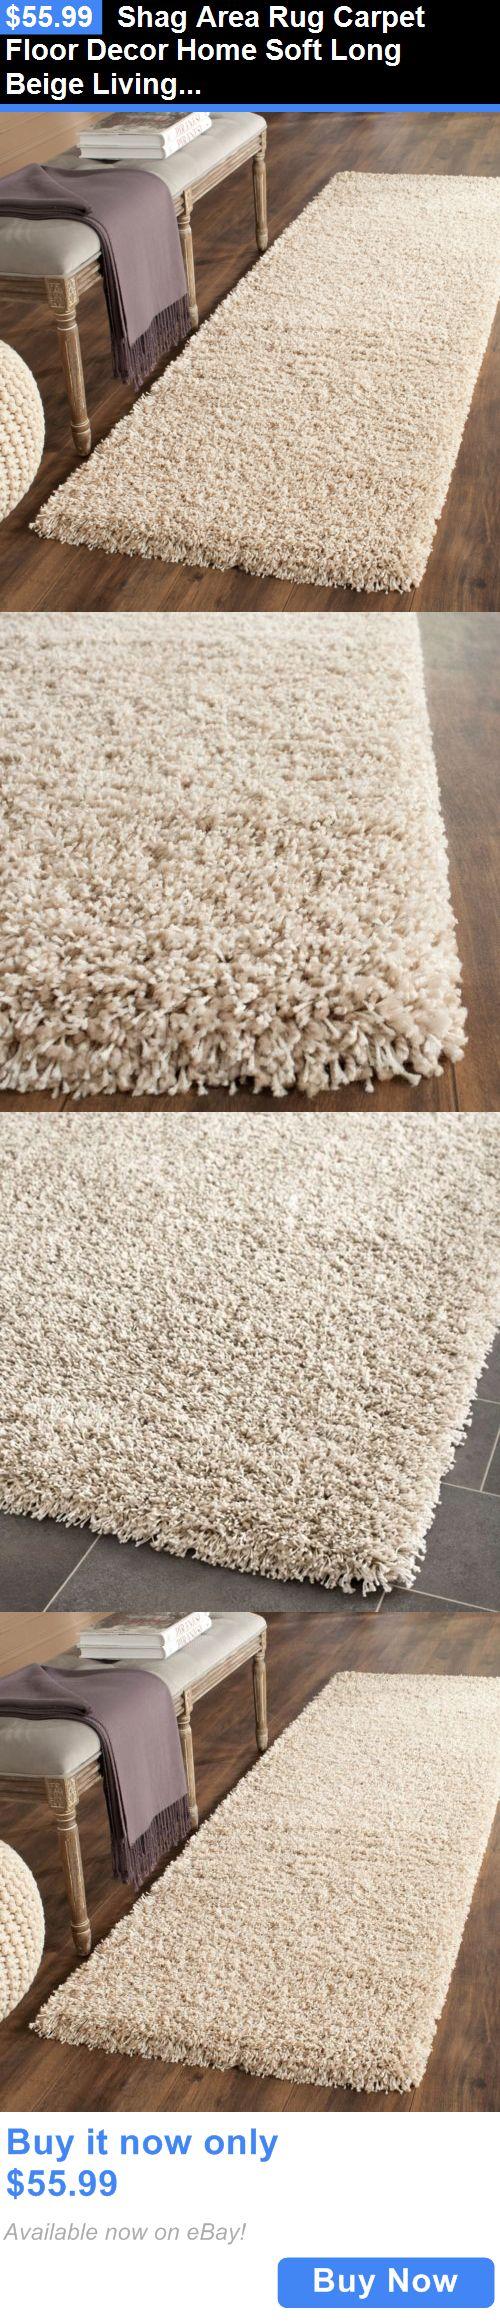 household items: Shag Area Rug Carpet Floor Decor Home Soft Long Beige Living Room Office Bedroom BUY IT NOW ONLY: $55.99